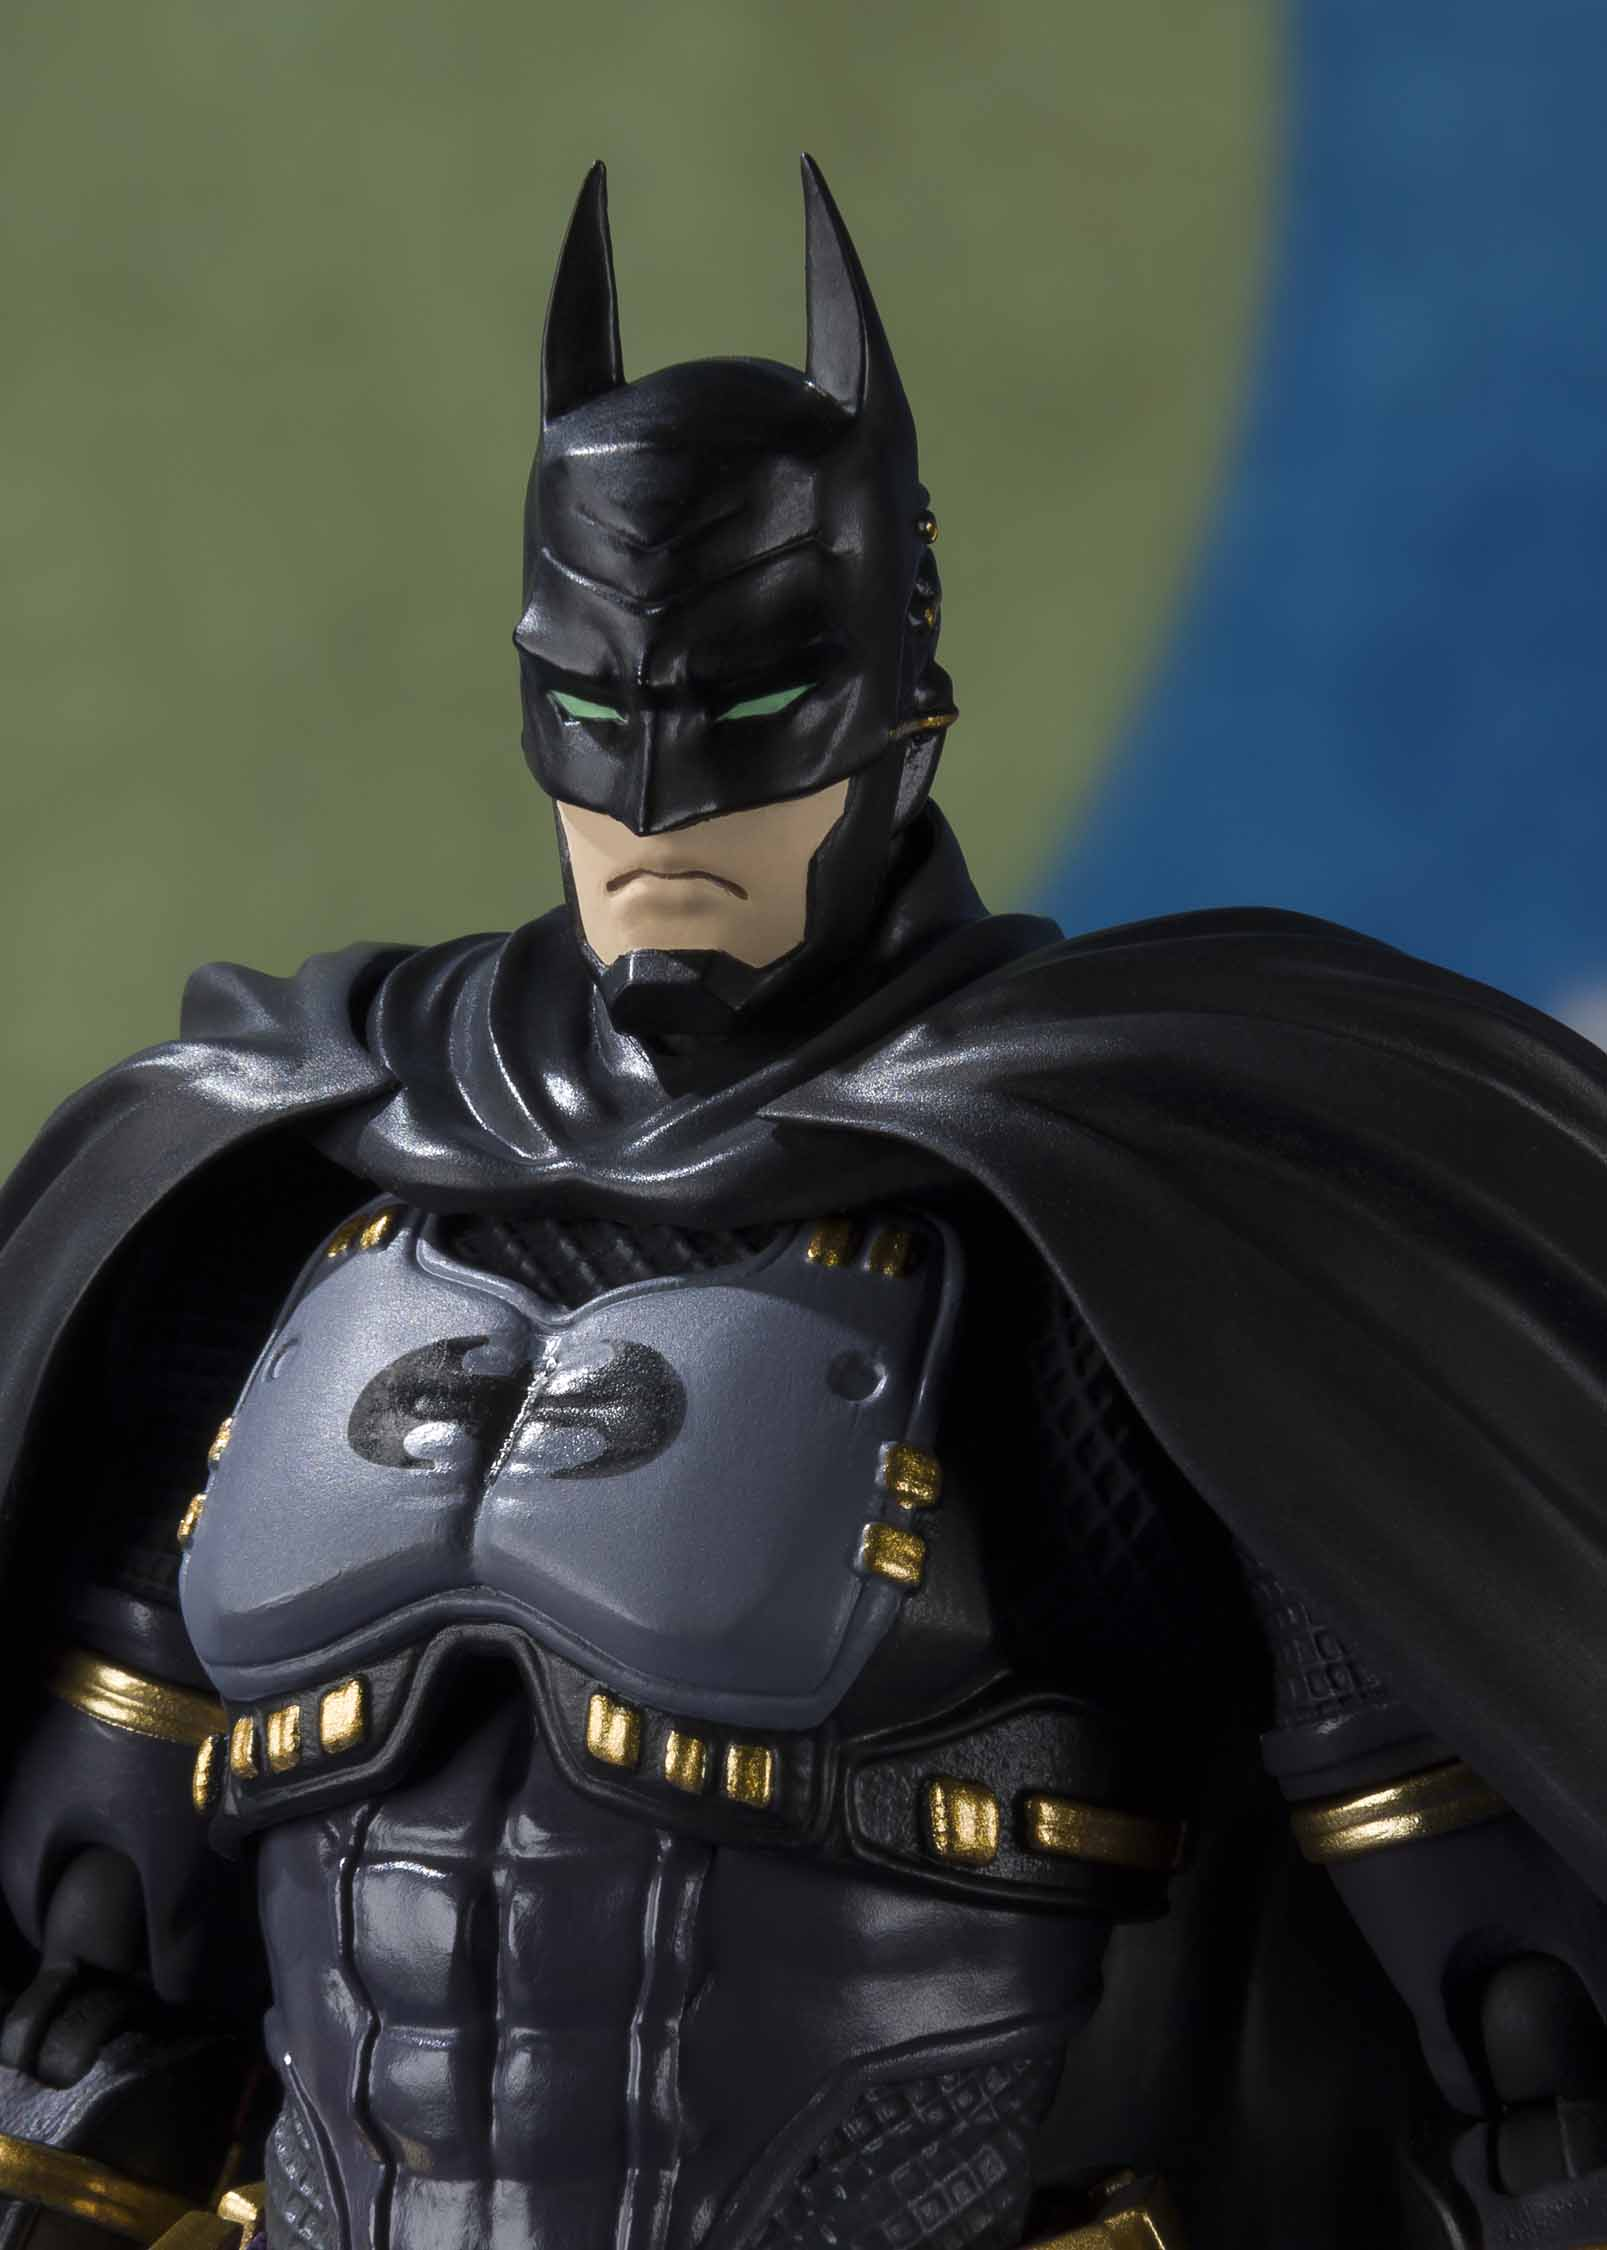 New BANDAI S.H.Figuarts japan animated movie NINJA BATMAN action figure toy gift